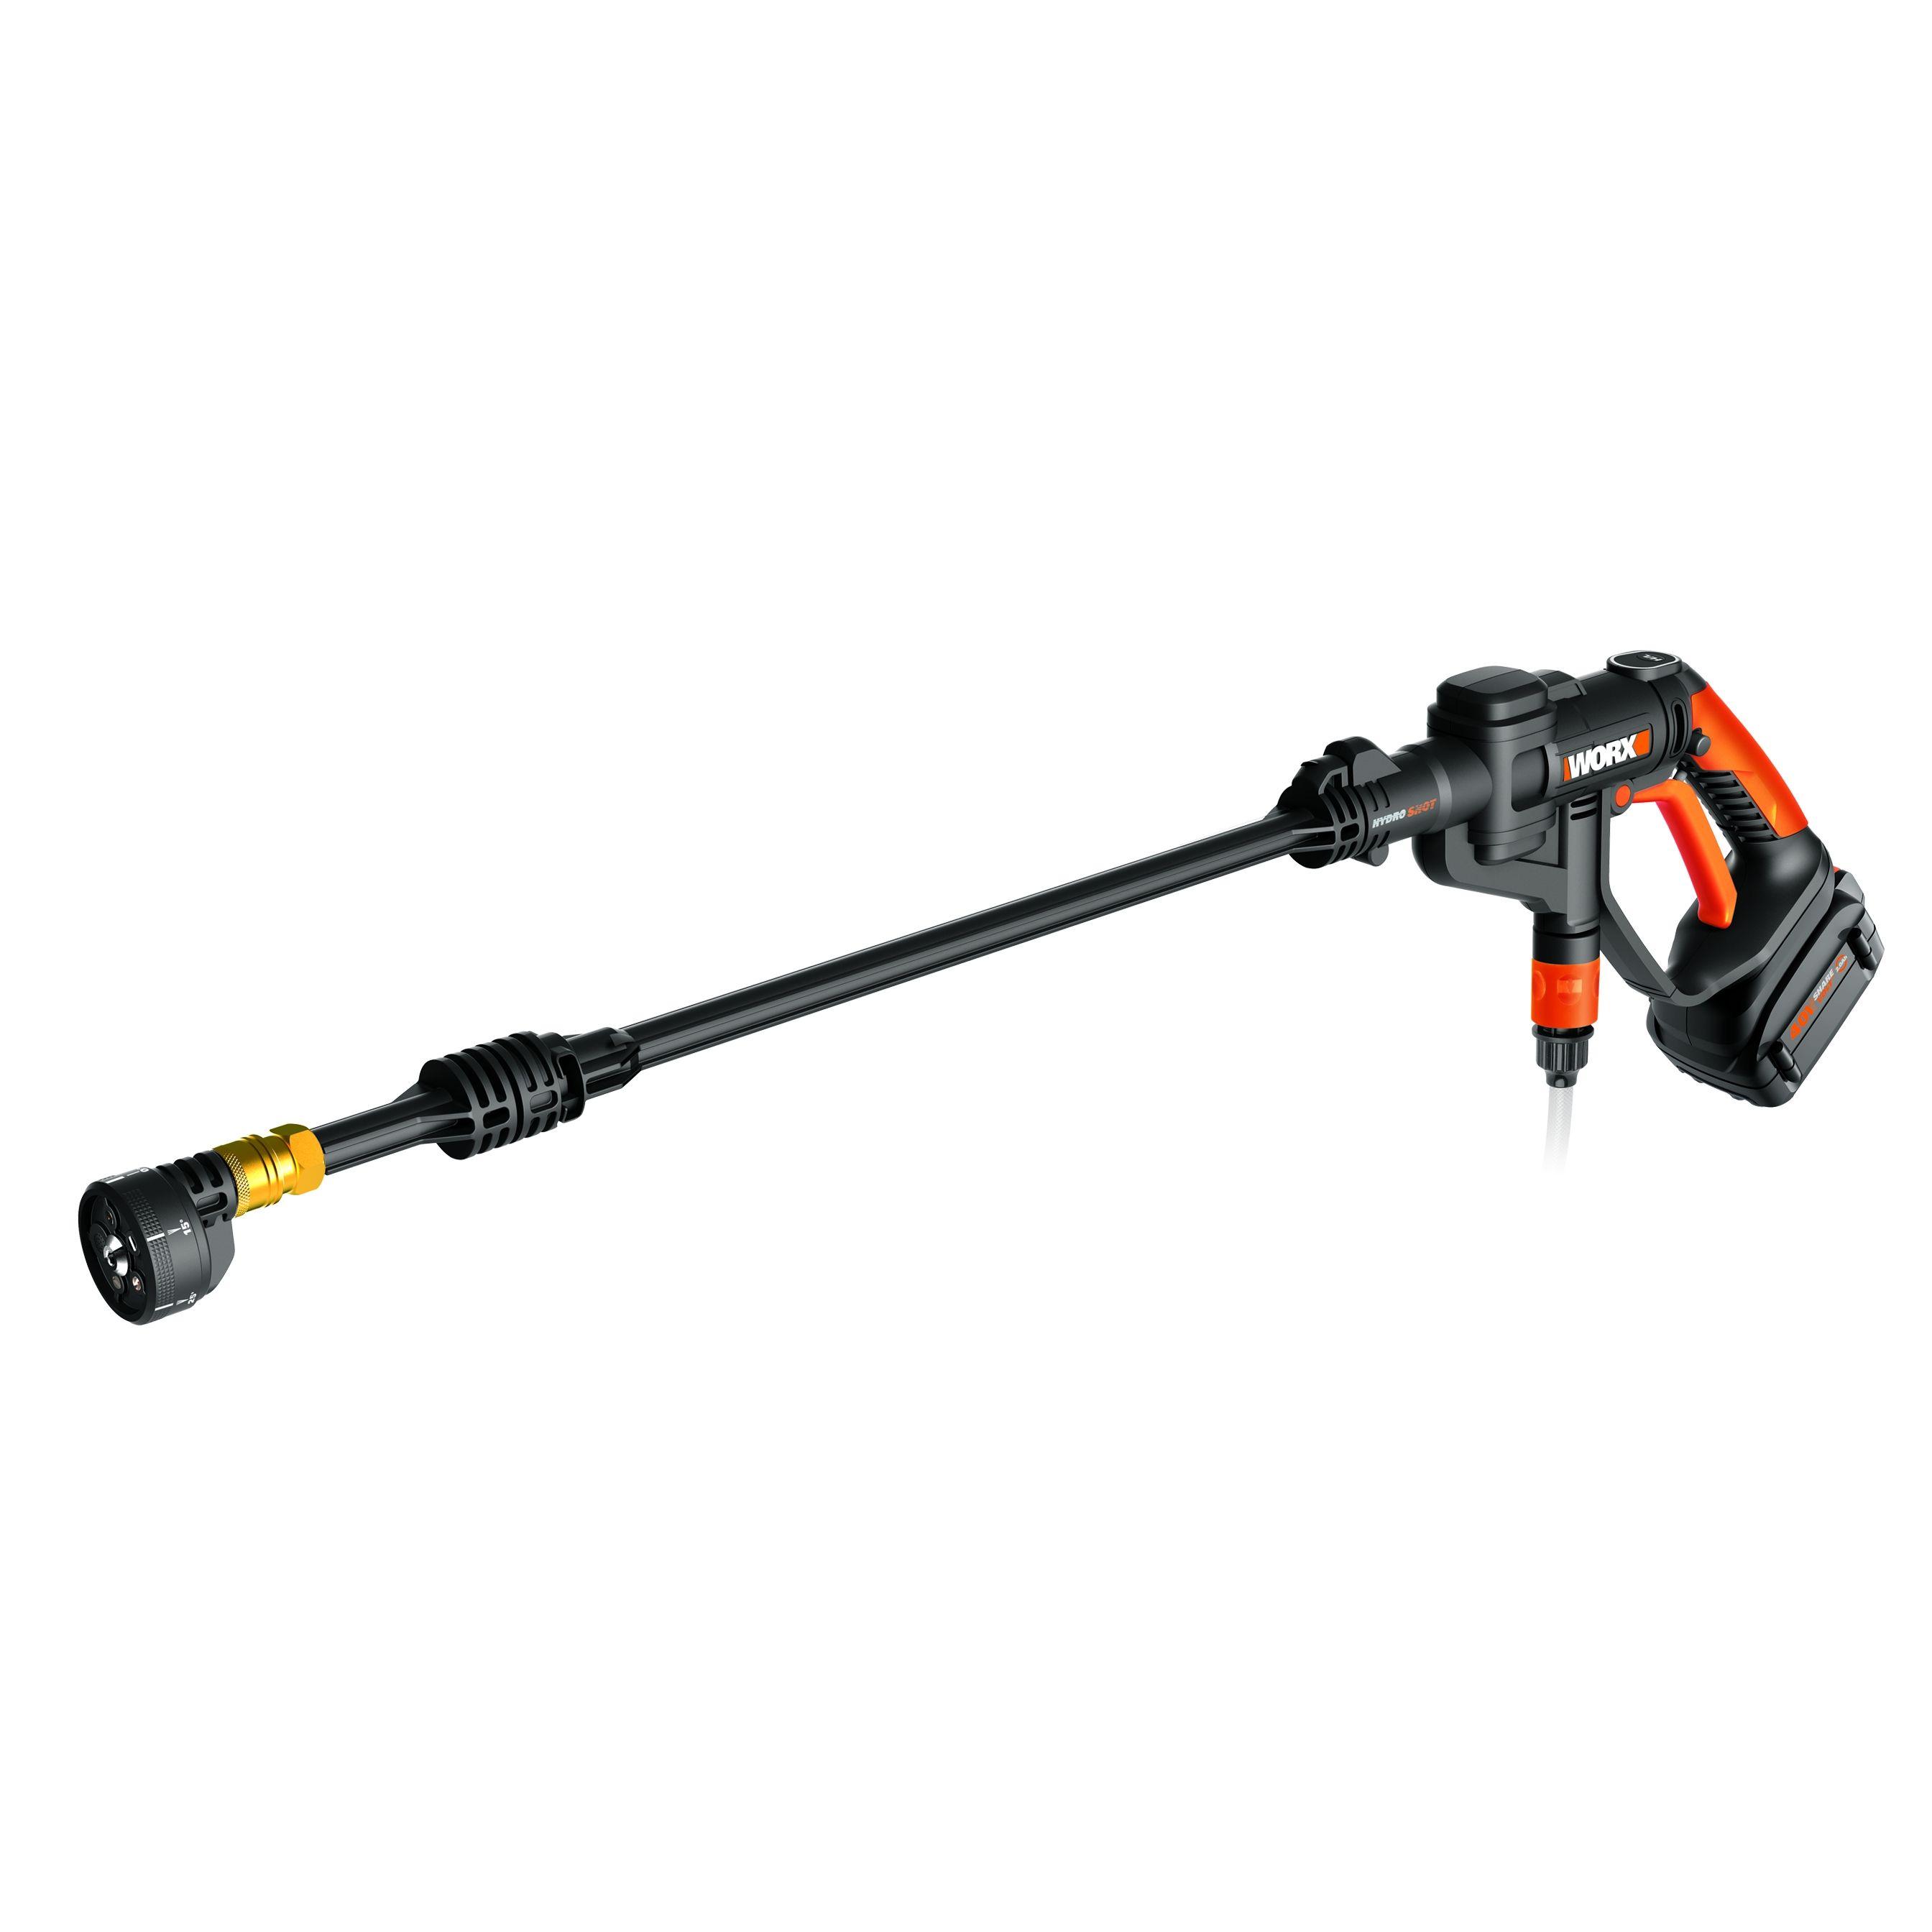 40V Hydroshot Portable Power Cleaner WG640 WORX